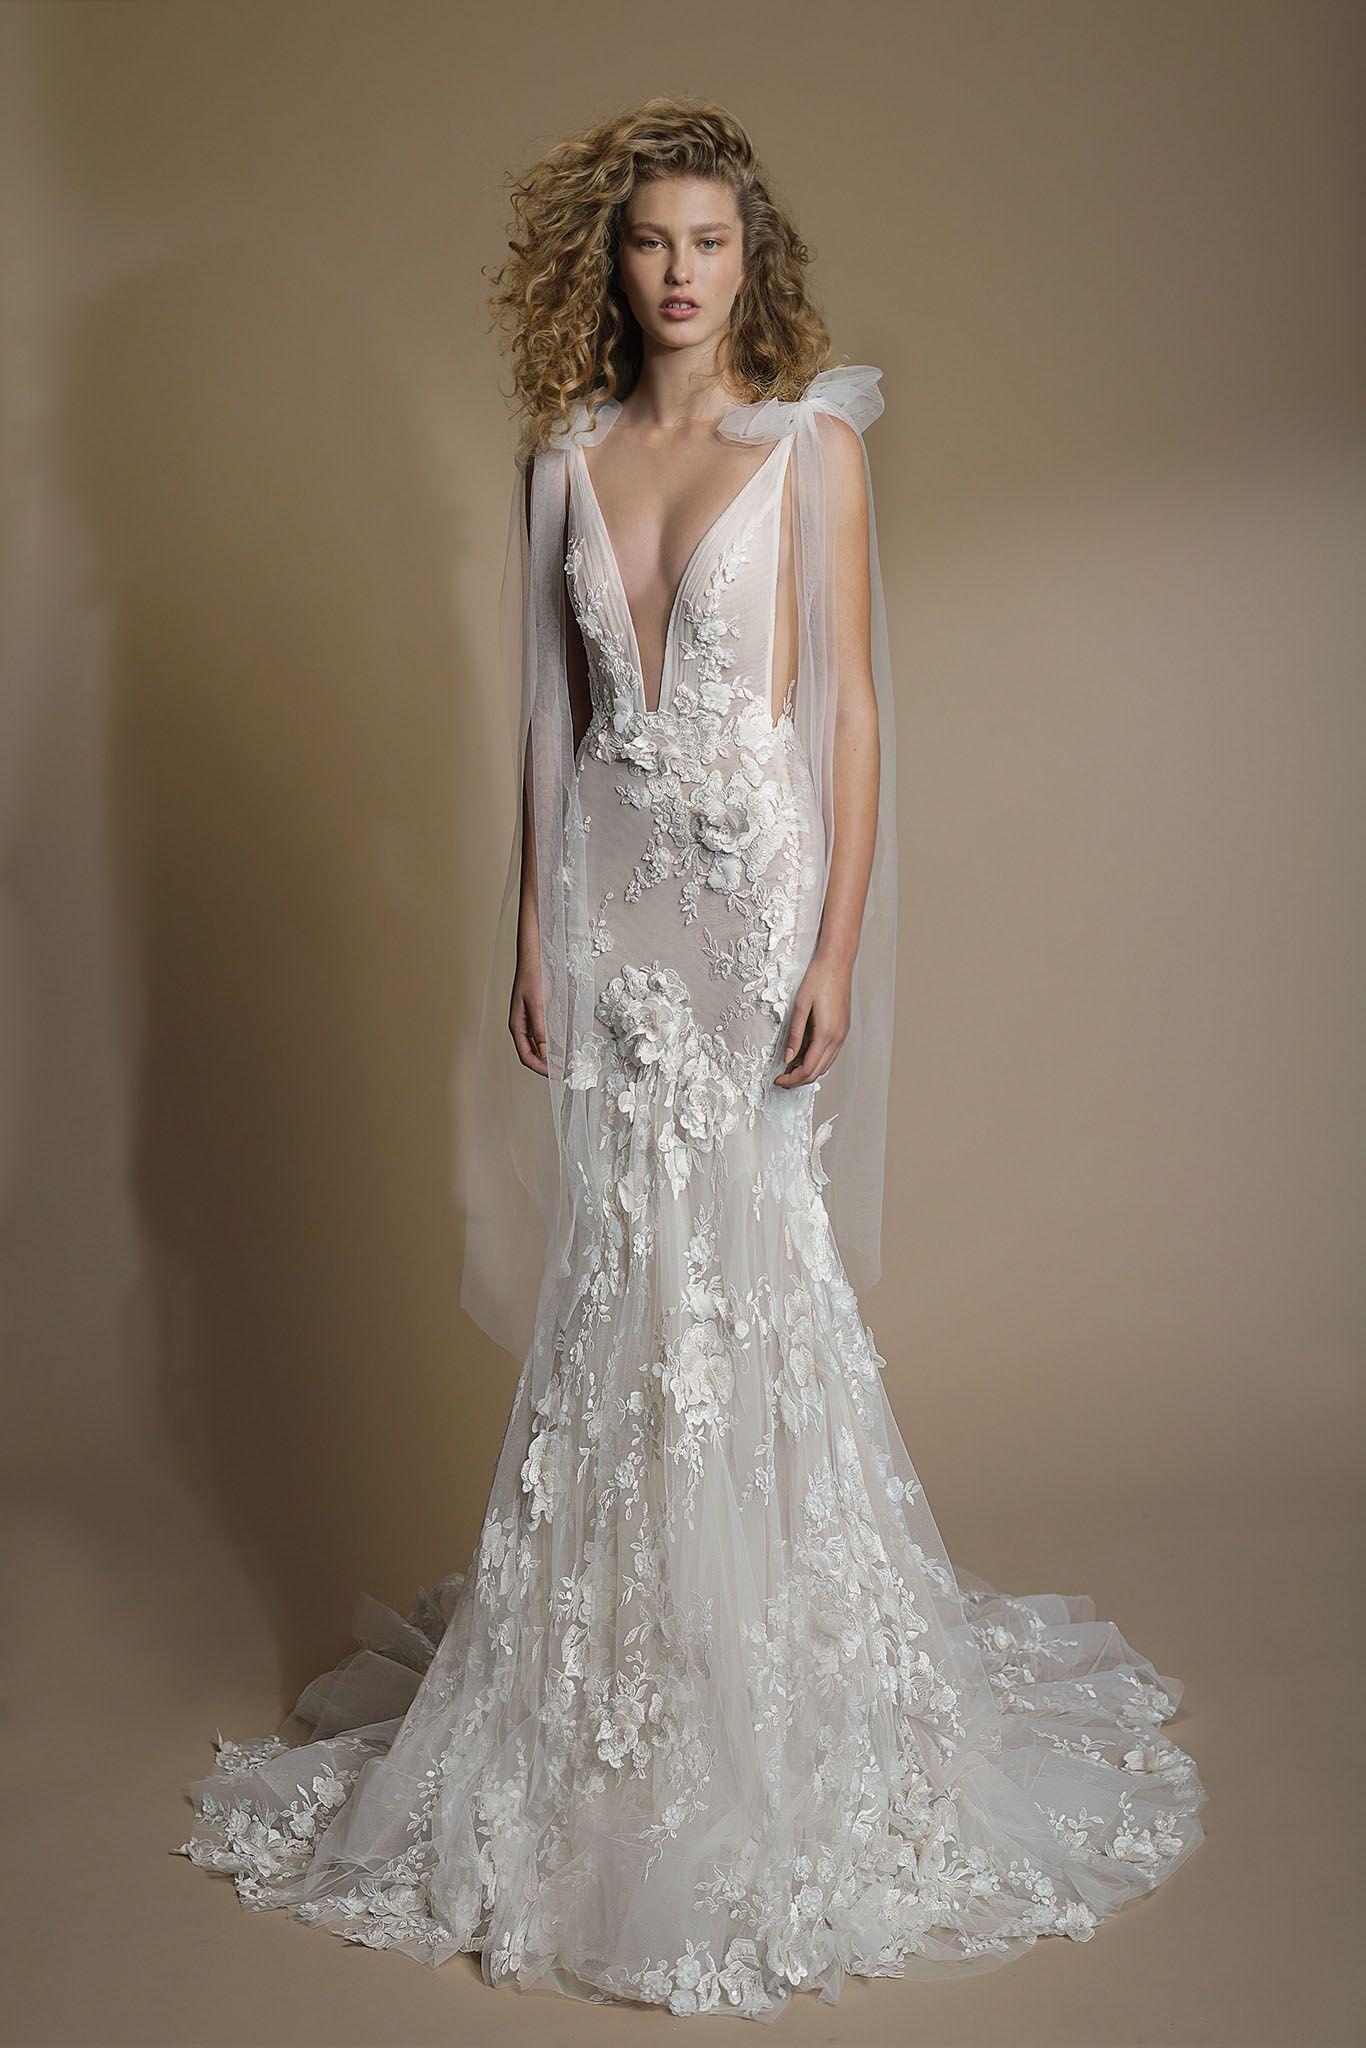 Wedding dress suit  GALA  wedding dress by Galia Lahav  Dress Designers  Pinterest